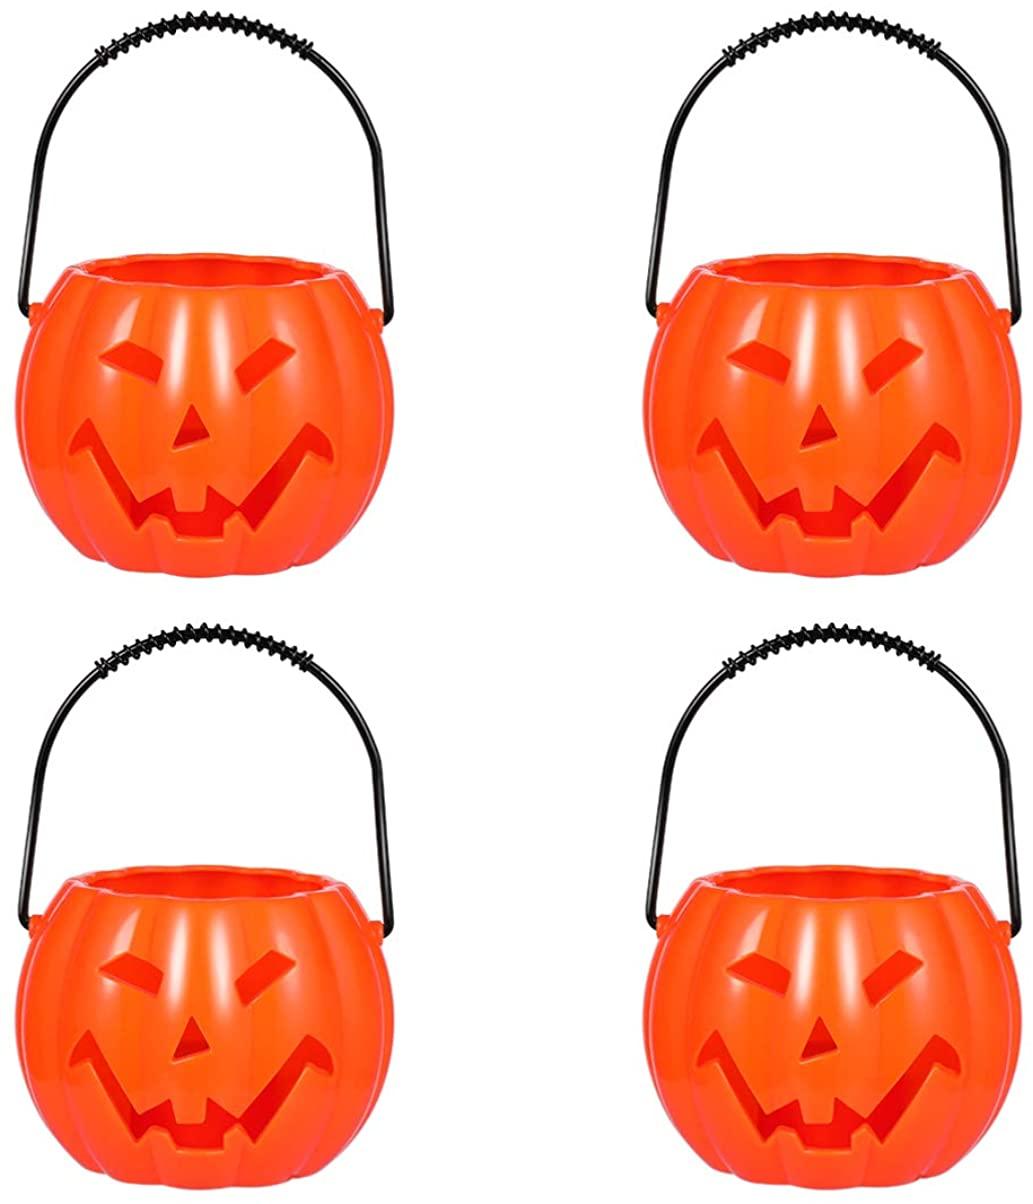 BESTOYARD 4pcs Halloween Pumpkin Buckets Trick Or Treat Candy Buckets Laugh and Light Pots Cosplay Party Costume Accessories